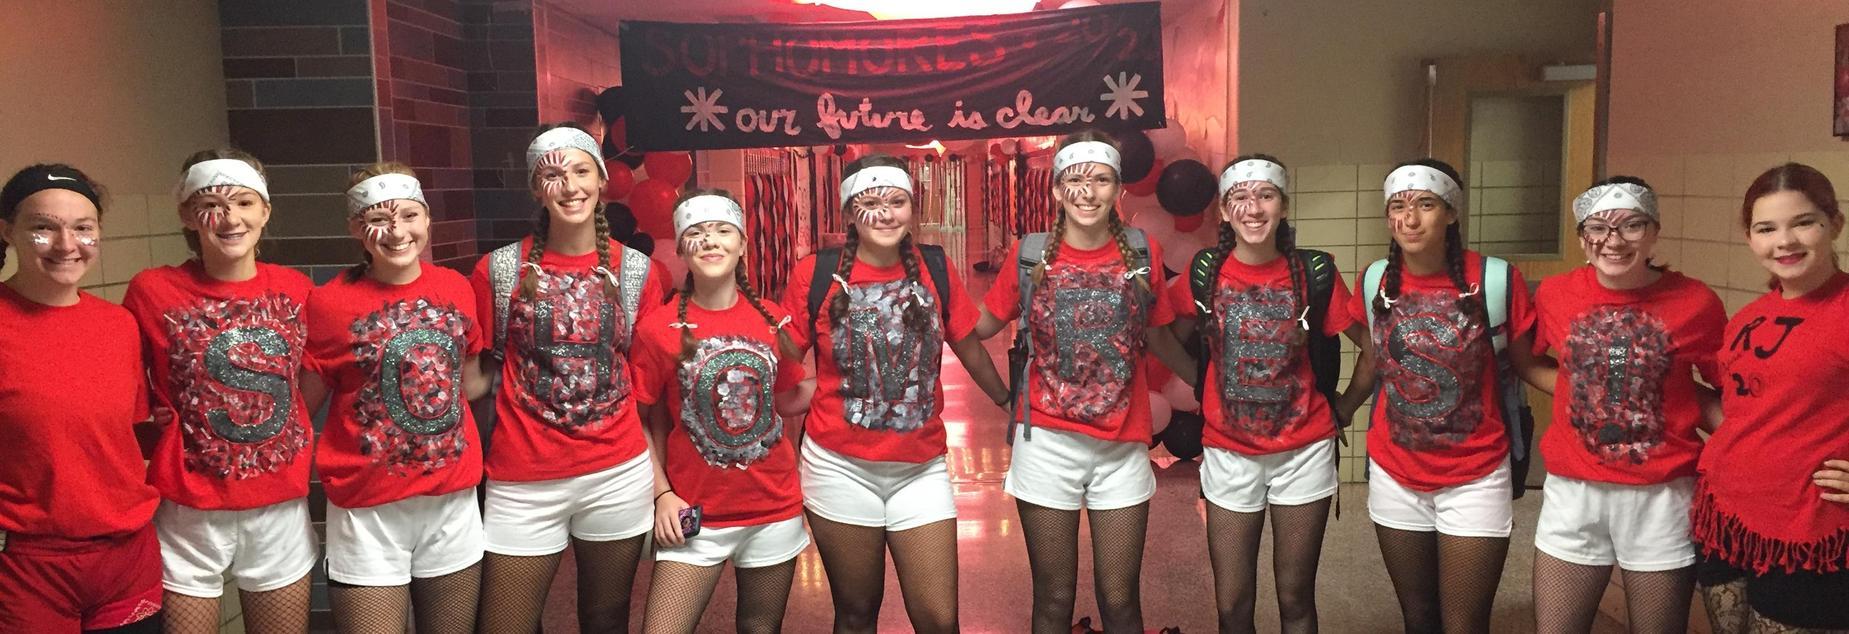 Sophomore's in spirit dress, 2017